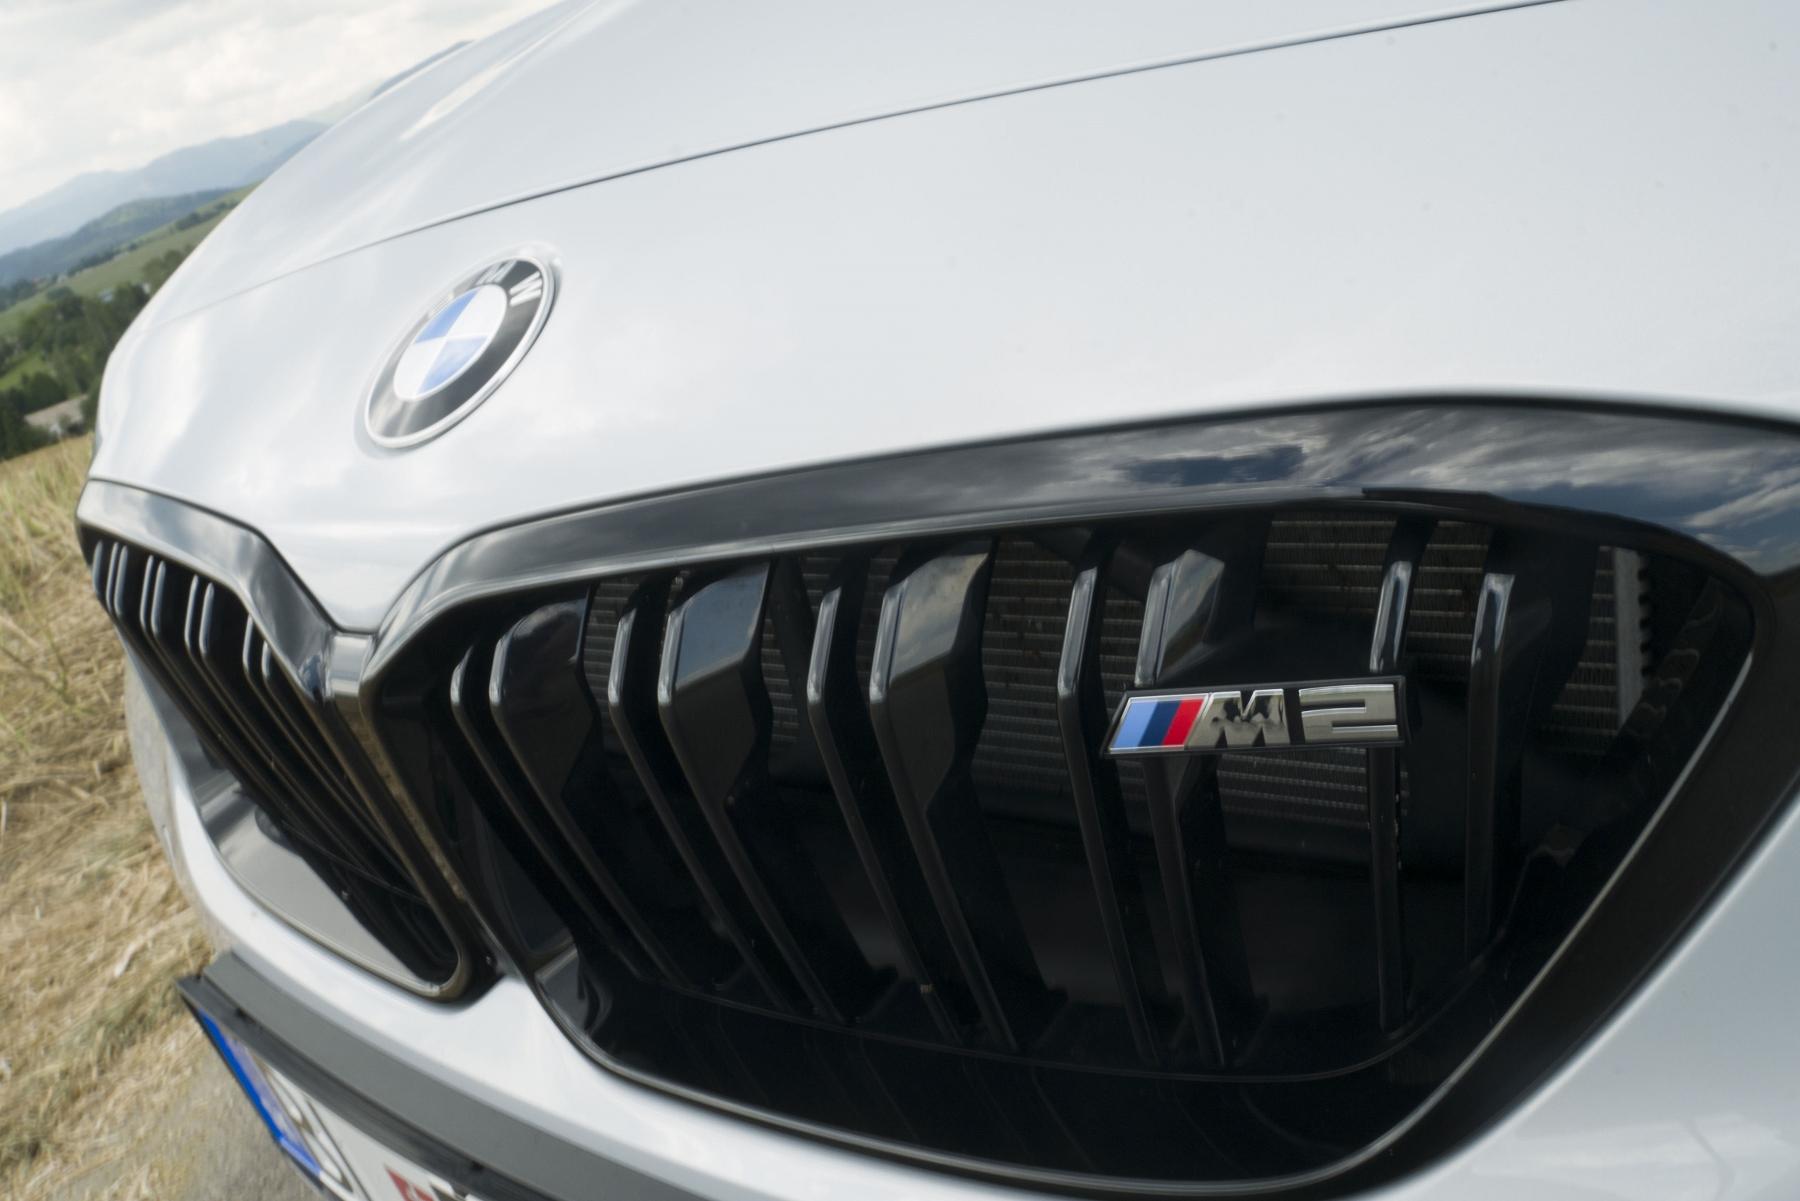 Test: BMW M2 Competition je nálož plná zábavy OfpiJr7bSO bmw-m2-14